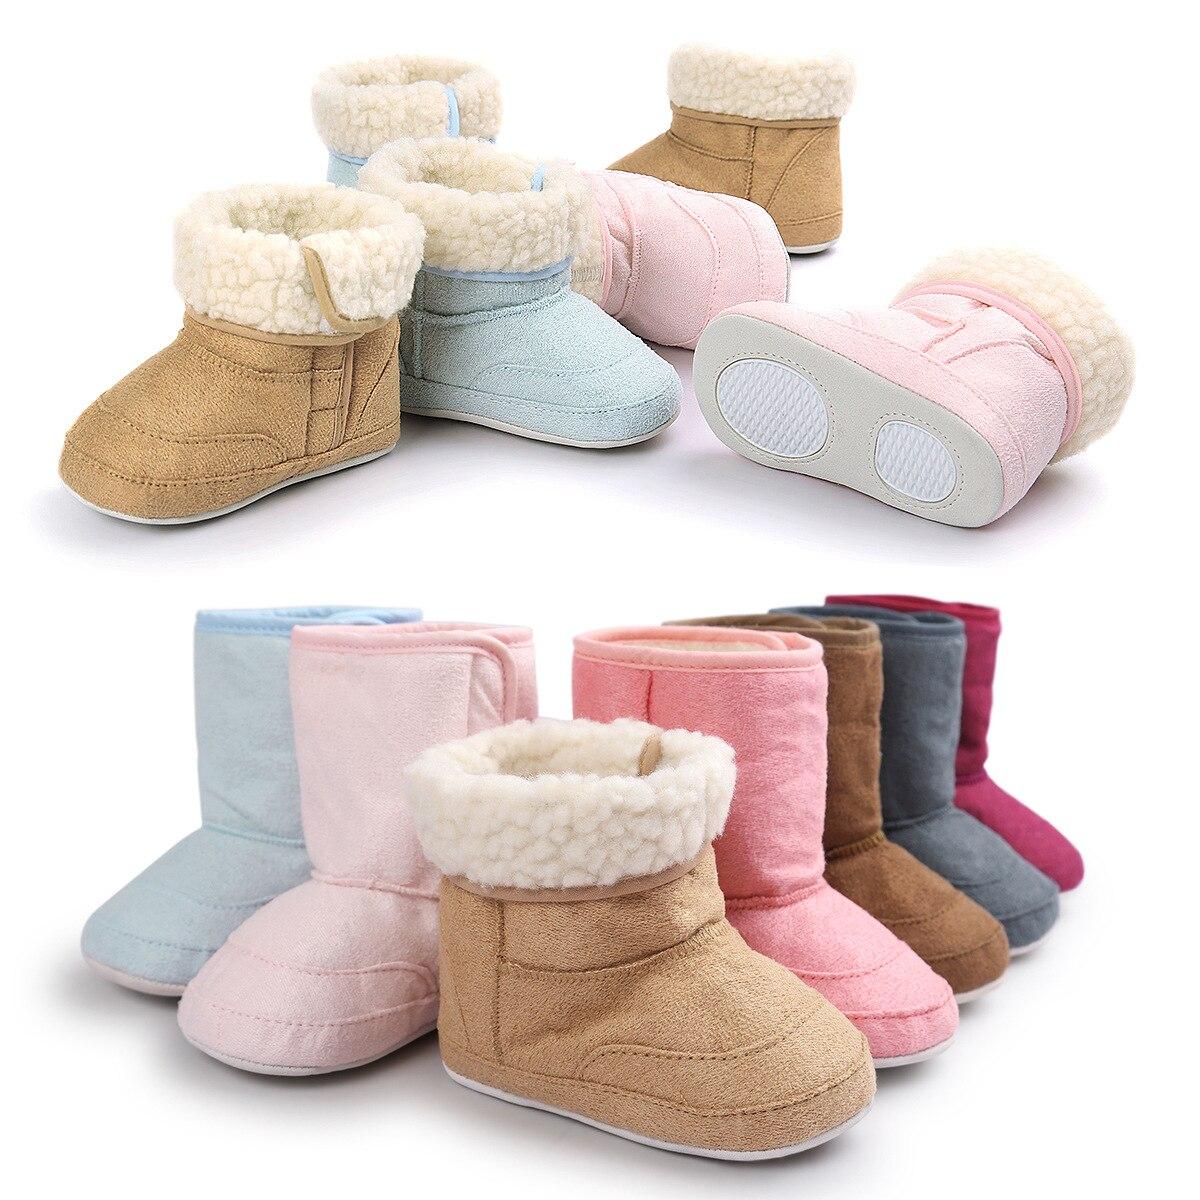 MiYuebb Winter Baby Snow Boots Khaki Infant Toddler Shoes Plus Cotton Rubber Soled Non-slip Children's Kids Shoes